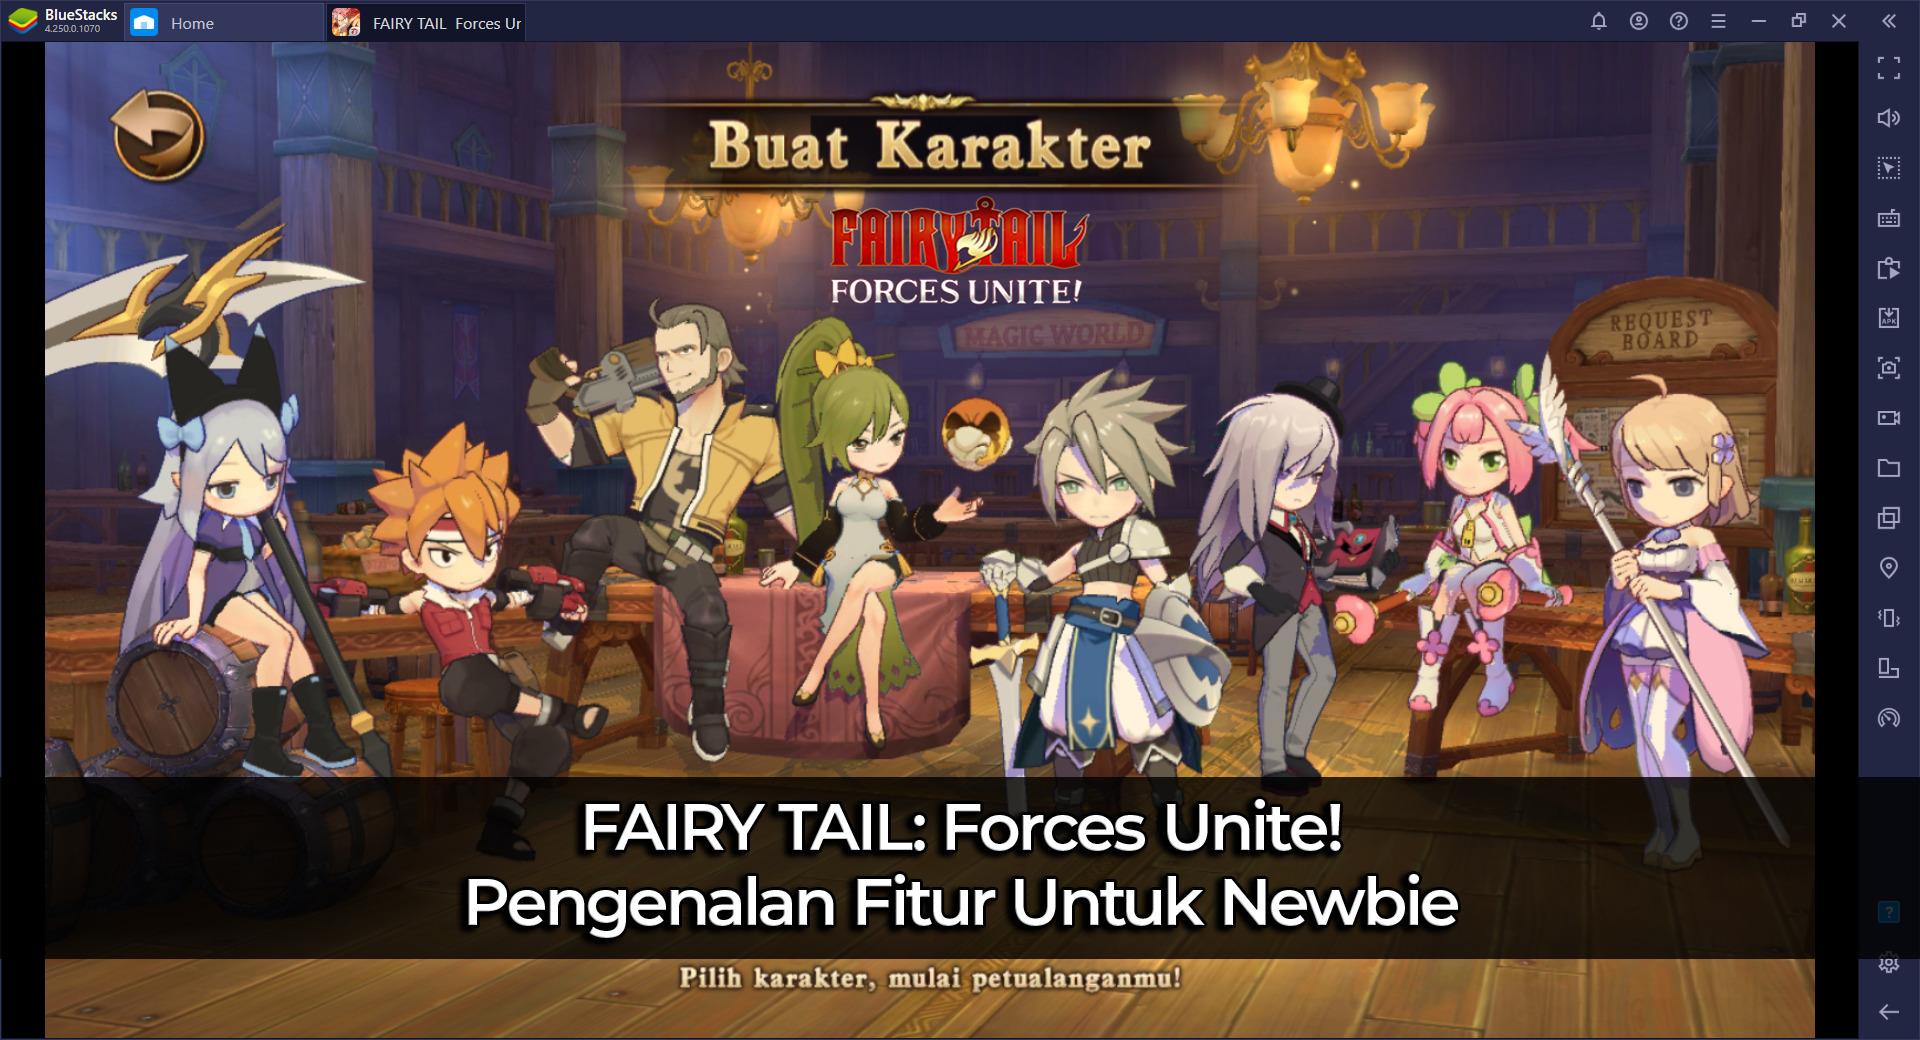 FAIRY TAIL: Forces Unite! Pengenalan Fitur Untuk Newbie